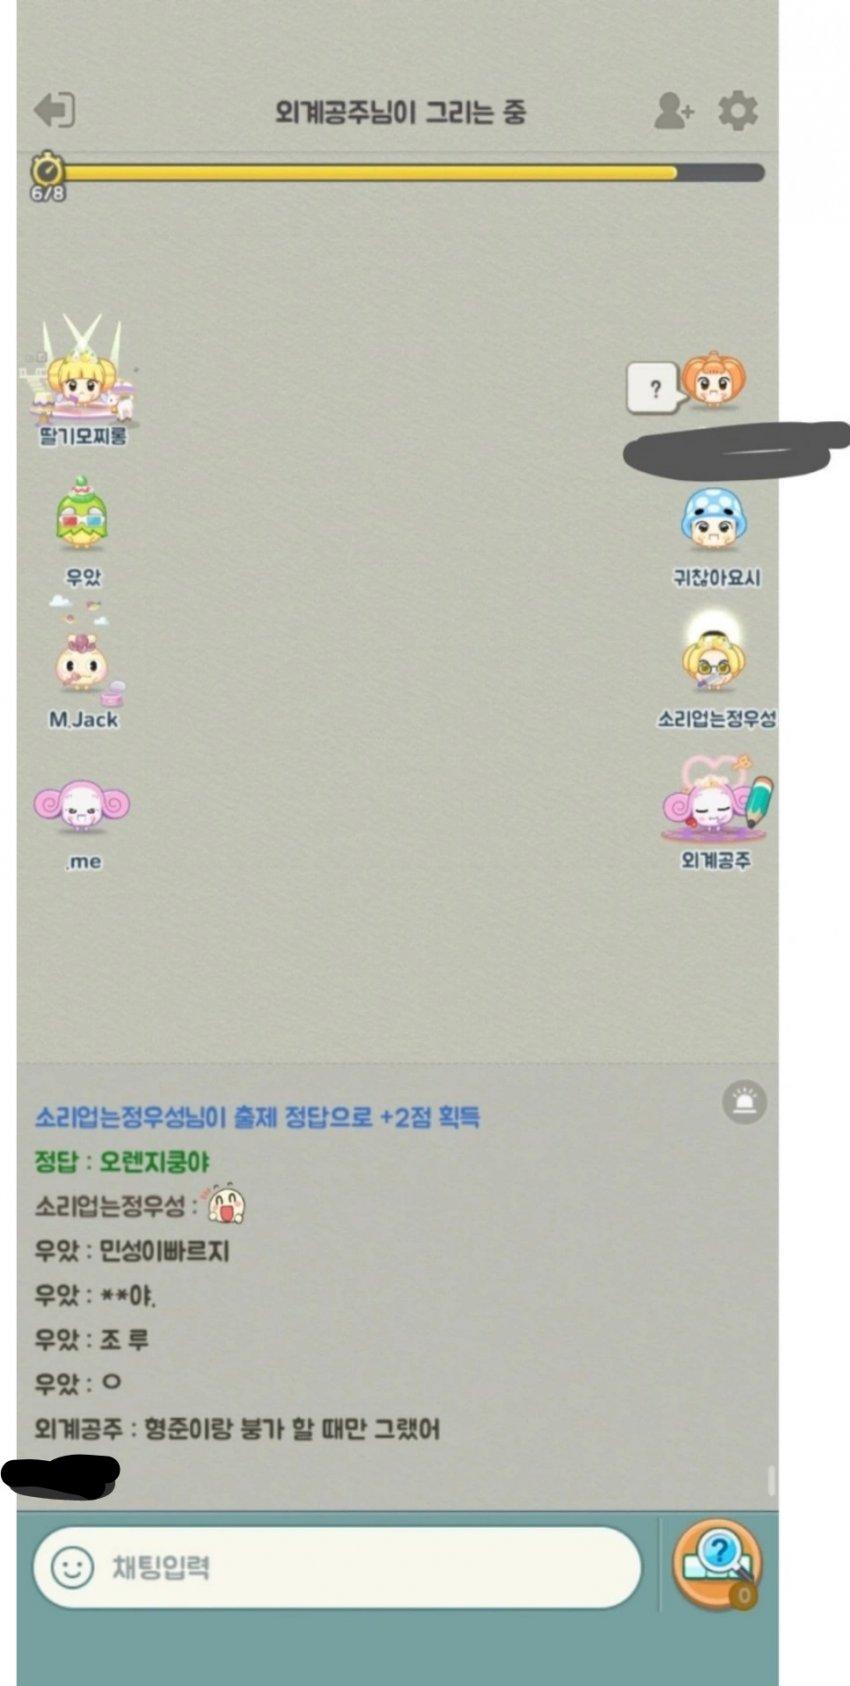 viewimage.php?id=2eb0d928e1&no=24b0d769e1d32ca73fec85fa11d02831fae8bba18eb64770514e6c44622c84df93aa997e1f66db27971df37e3c2b269352610e579a7e7d8b80ace1a2d28114218e7e98d1e76927f2e7c56bf7eee75bccd7ffa3